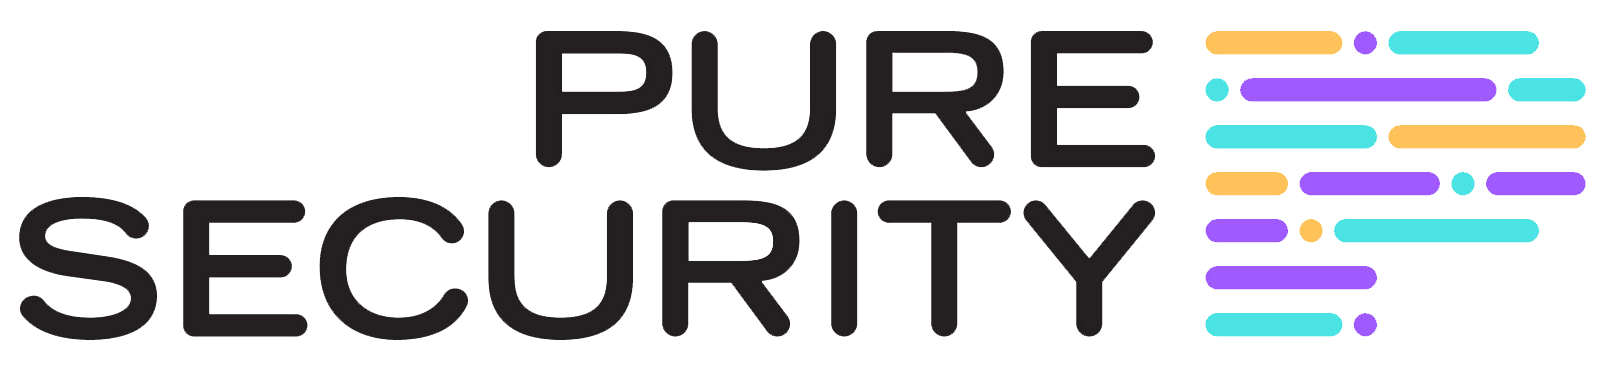 PS-Logo-nogbg-cropped